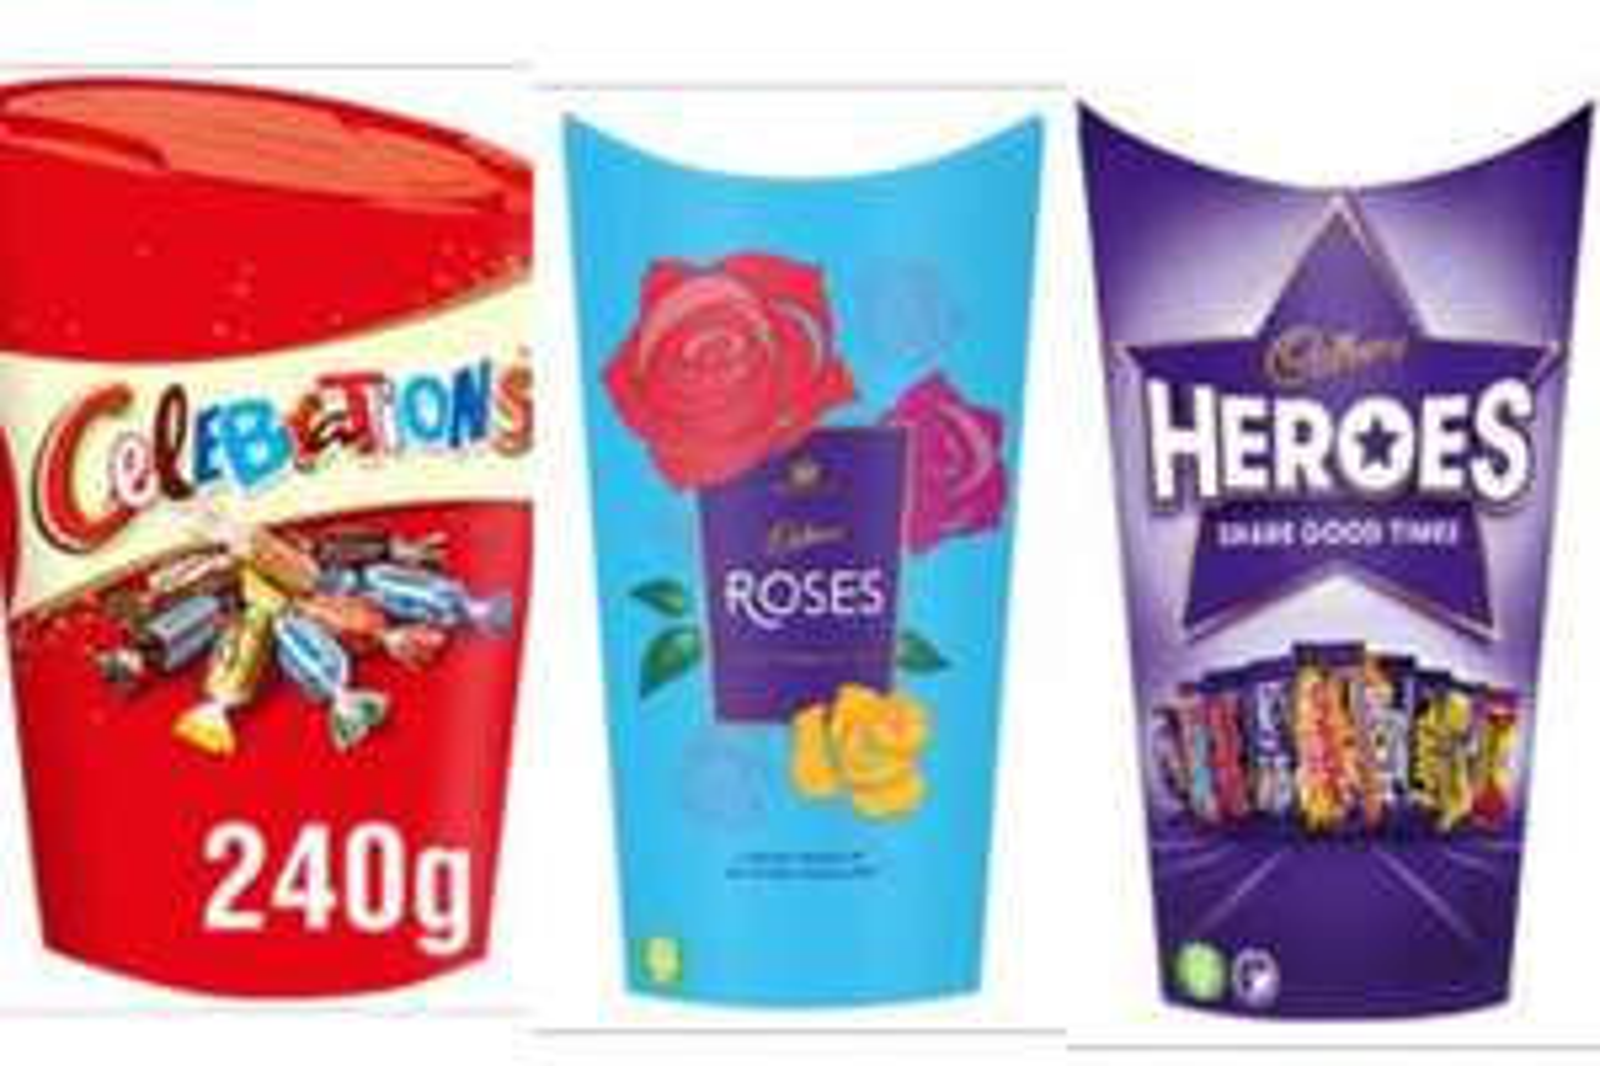 Cadbury Roses 290g / Celebrations 240g / Cadbury Heroes 290g - £2 (Clubcard, Min Spend / Delivery Fee Applies) @ Tesco